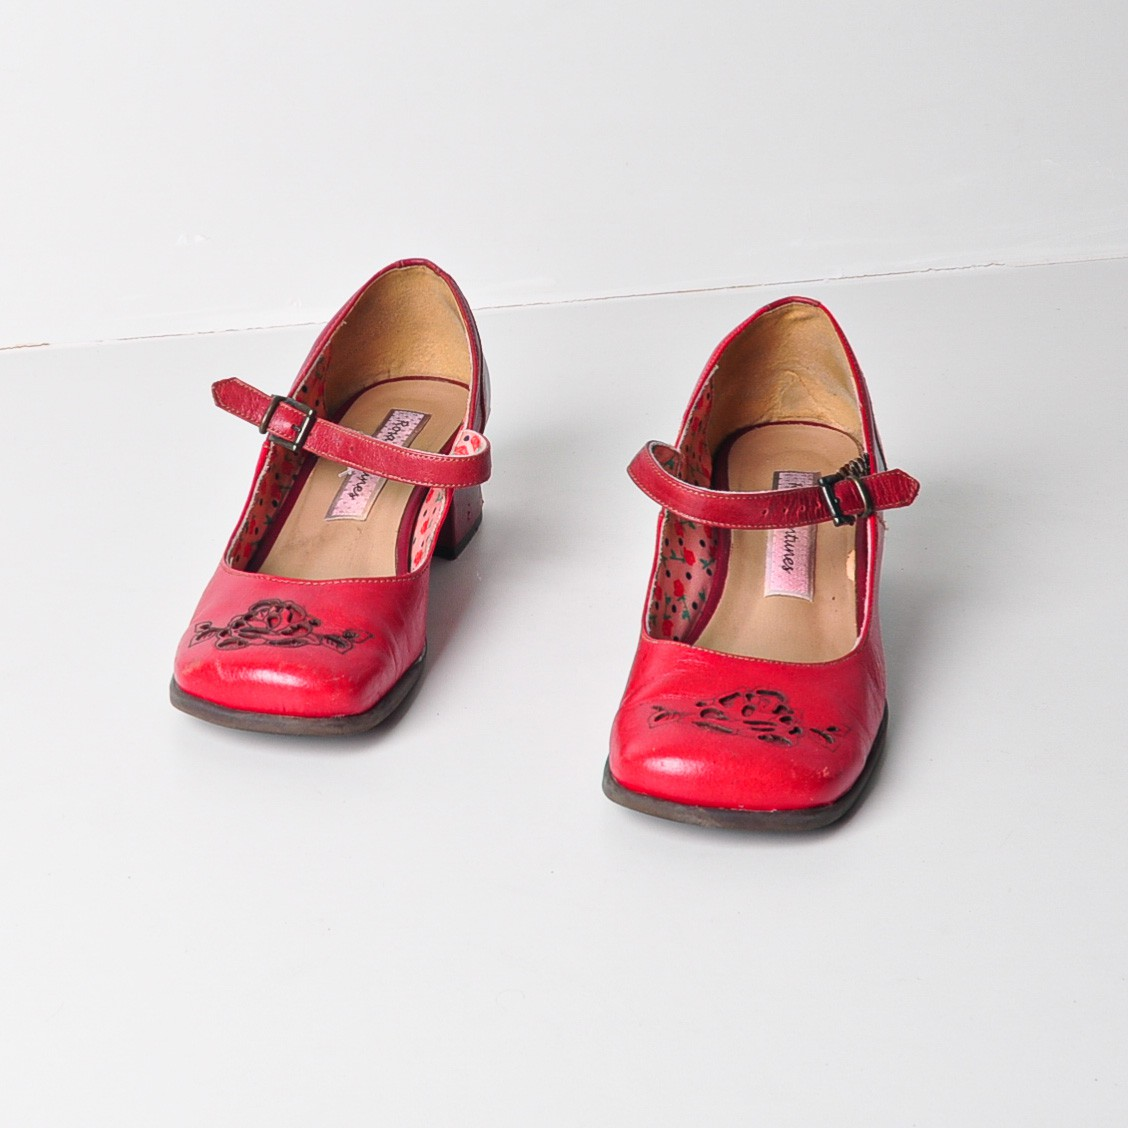 Sapato Rosa Antunes- Tam 33